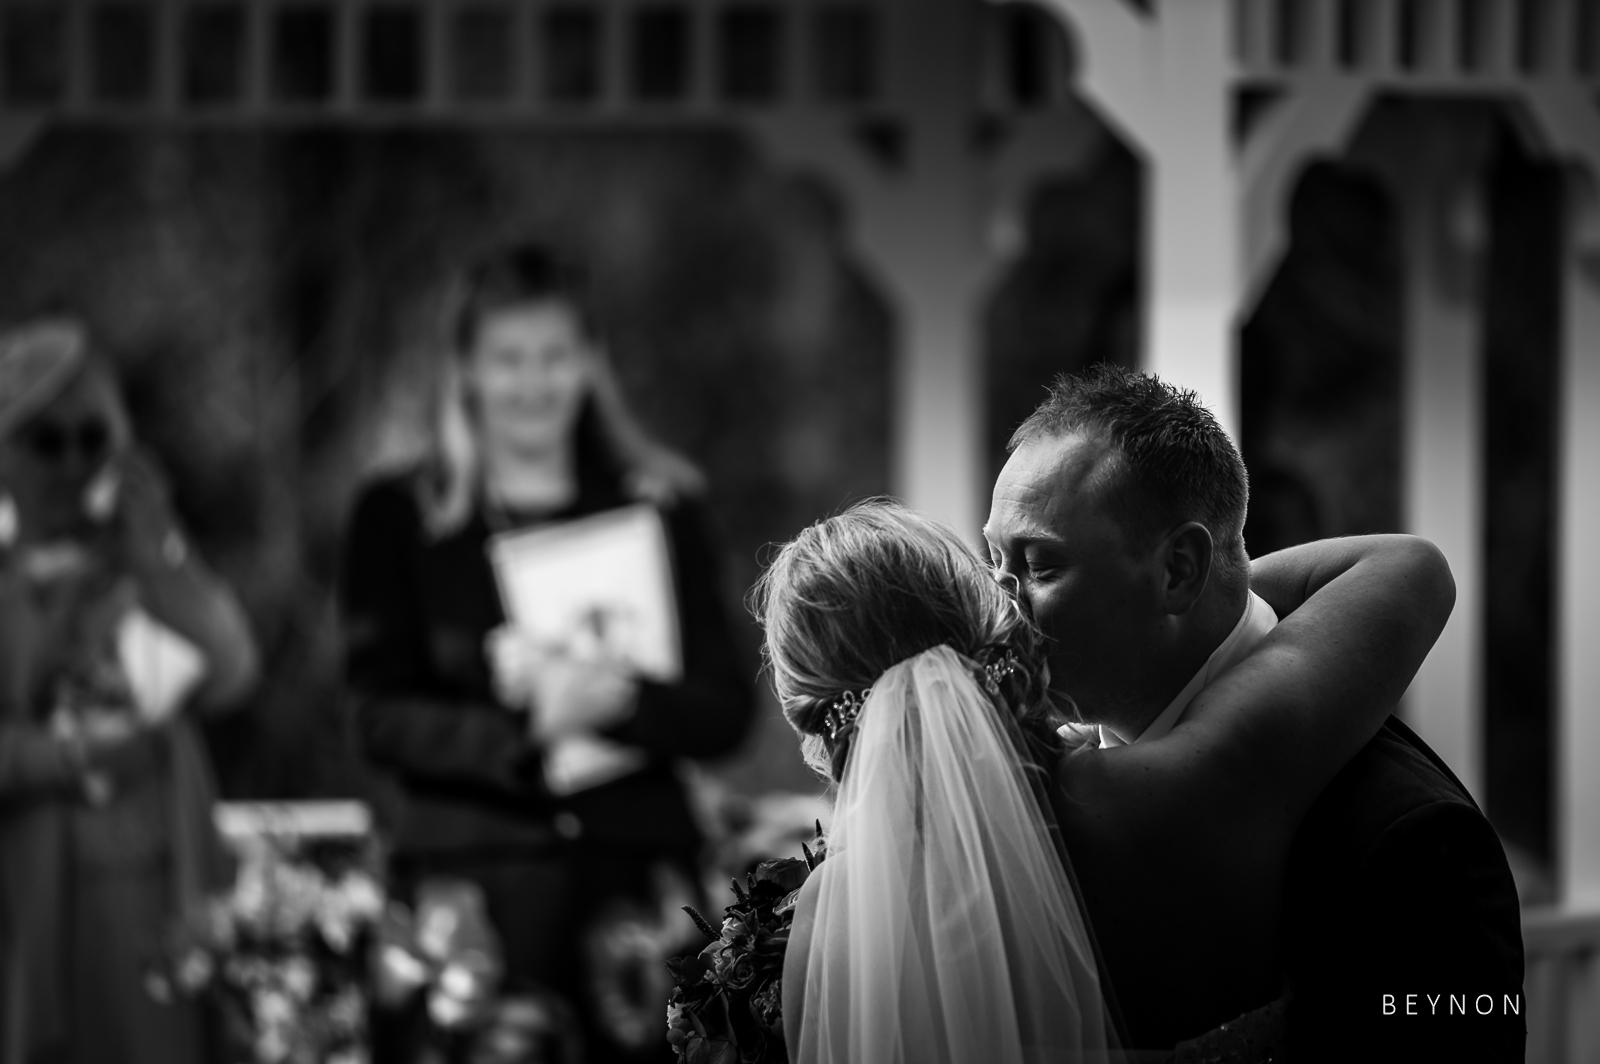 The Groom kisses his Bride